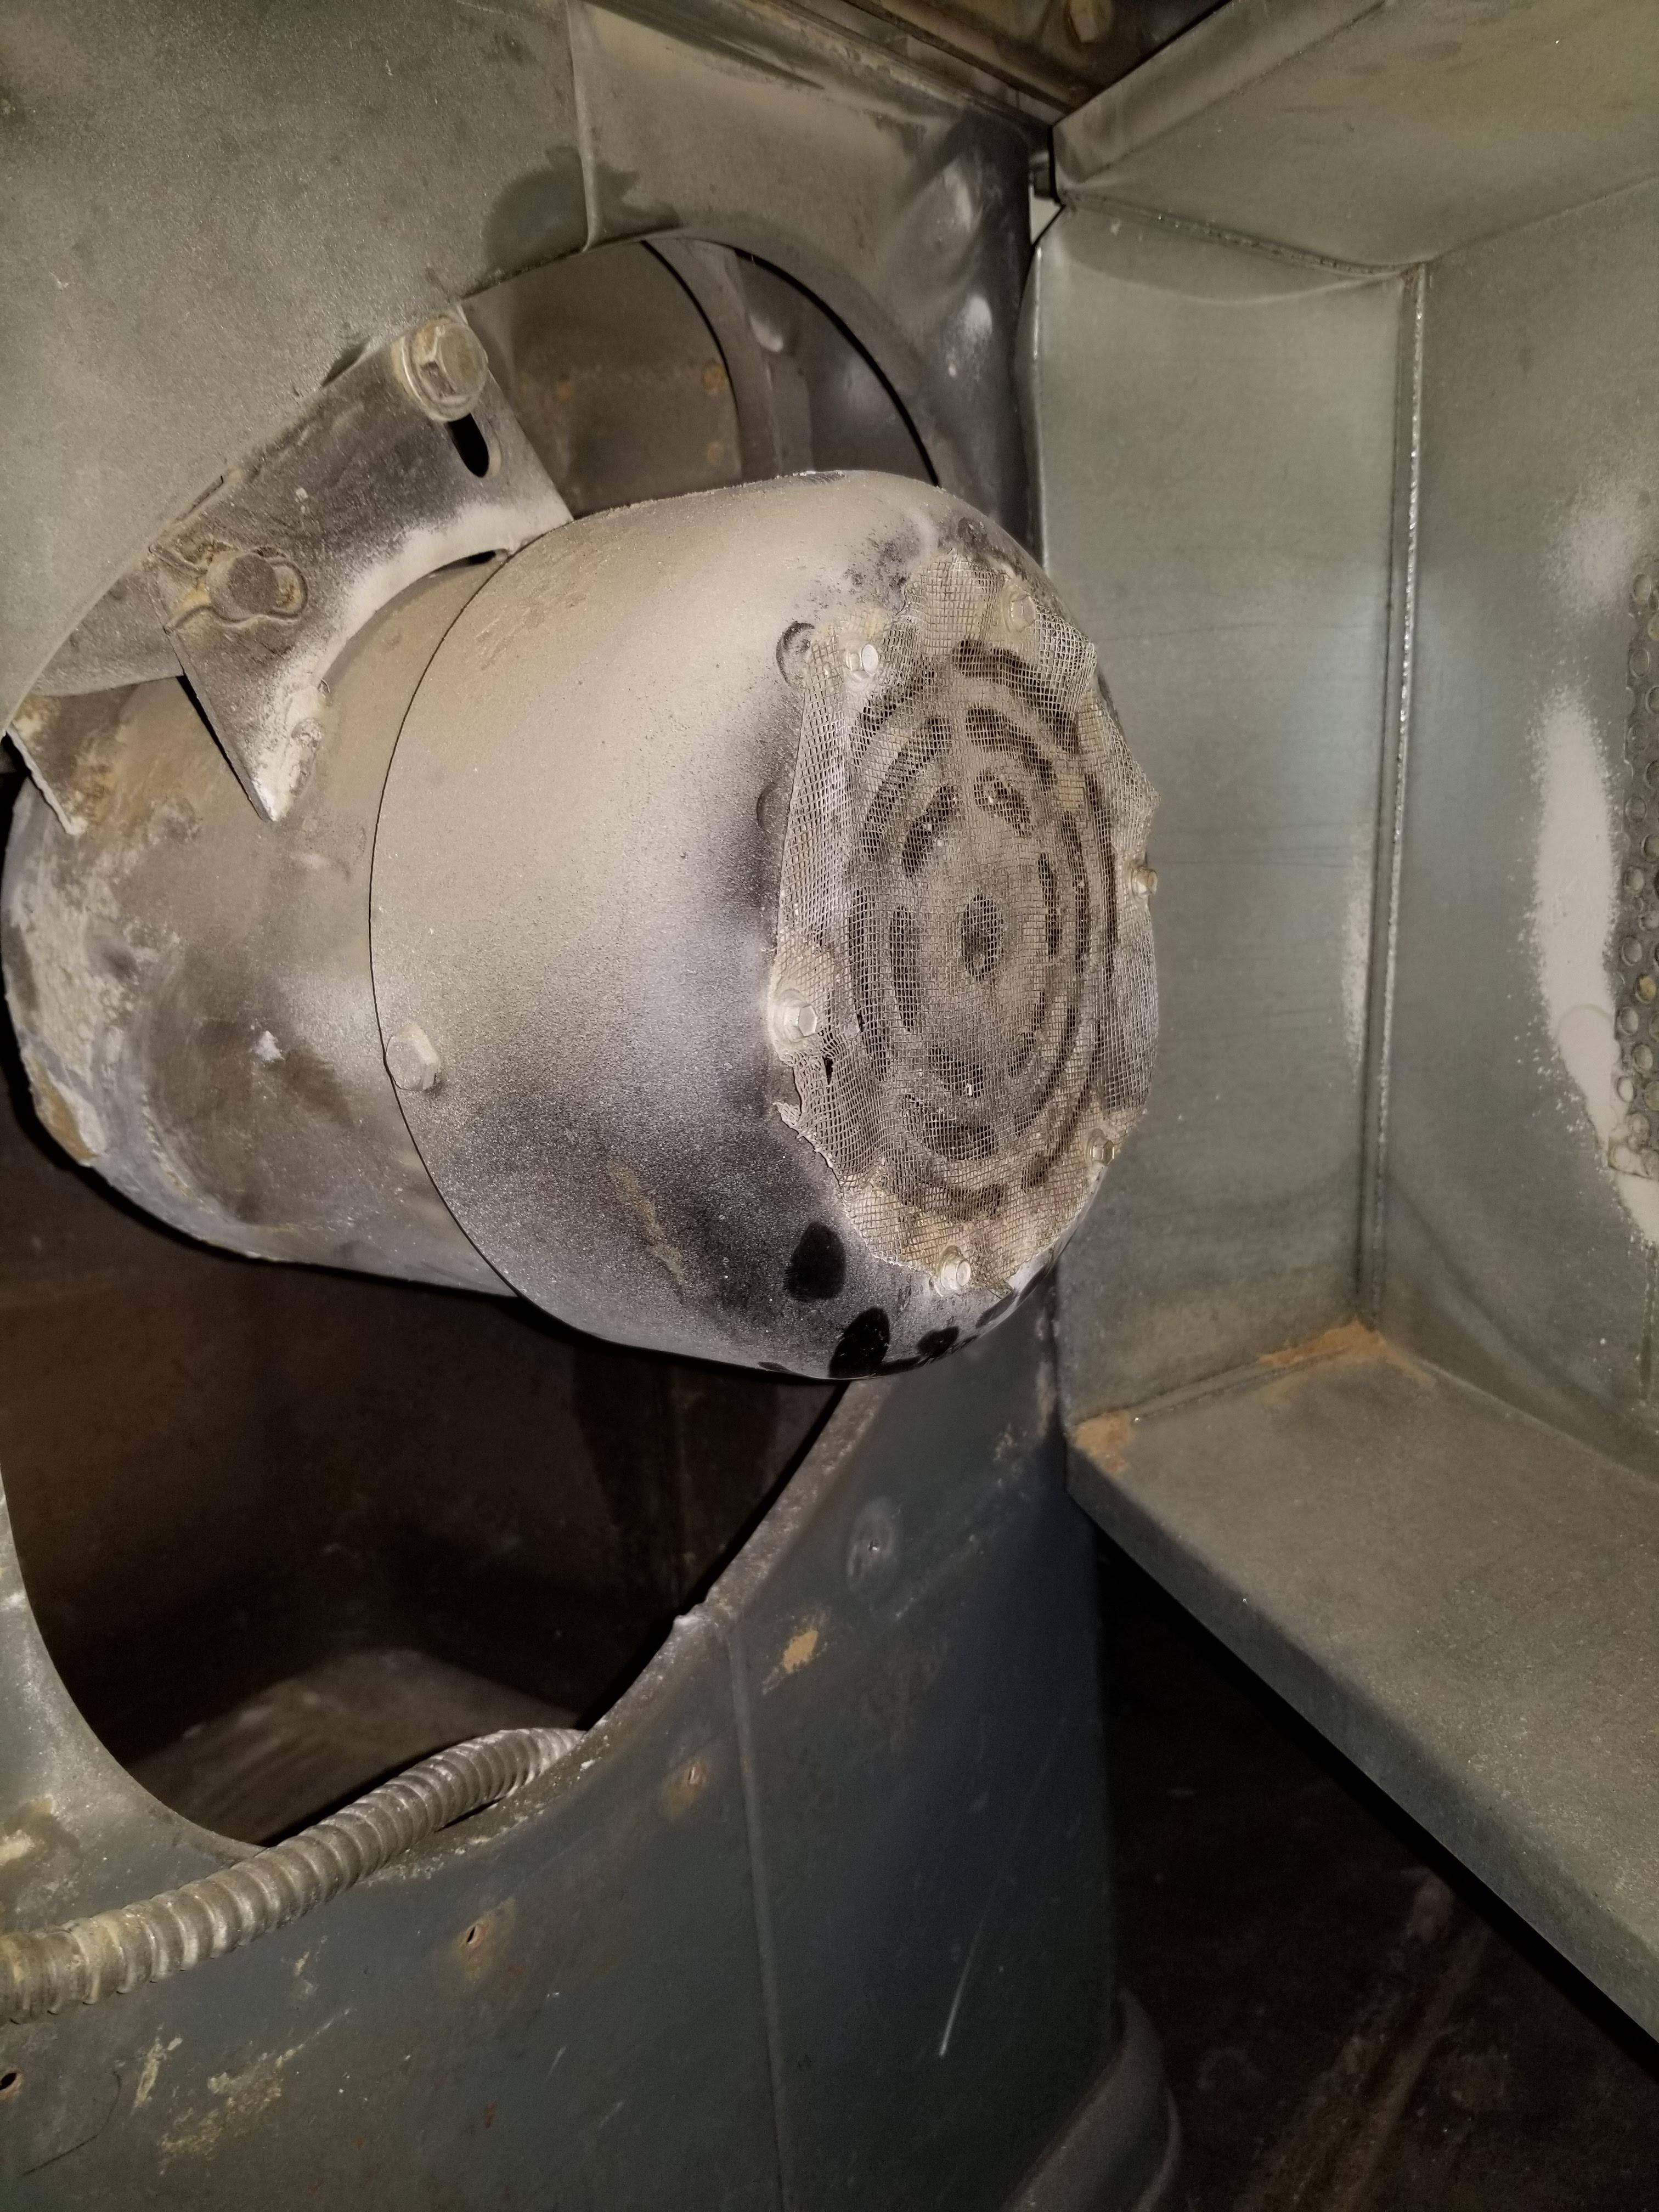 "Lot 16 - Delta 10"" unisaw w/ 50"" Biesemeyer rails & fence 230V 3ph"